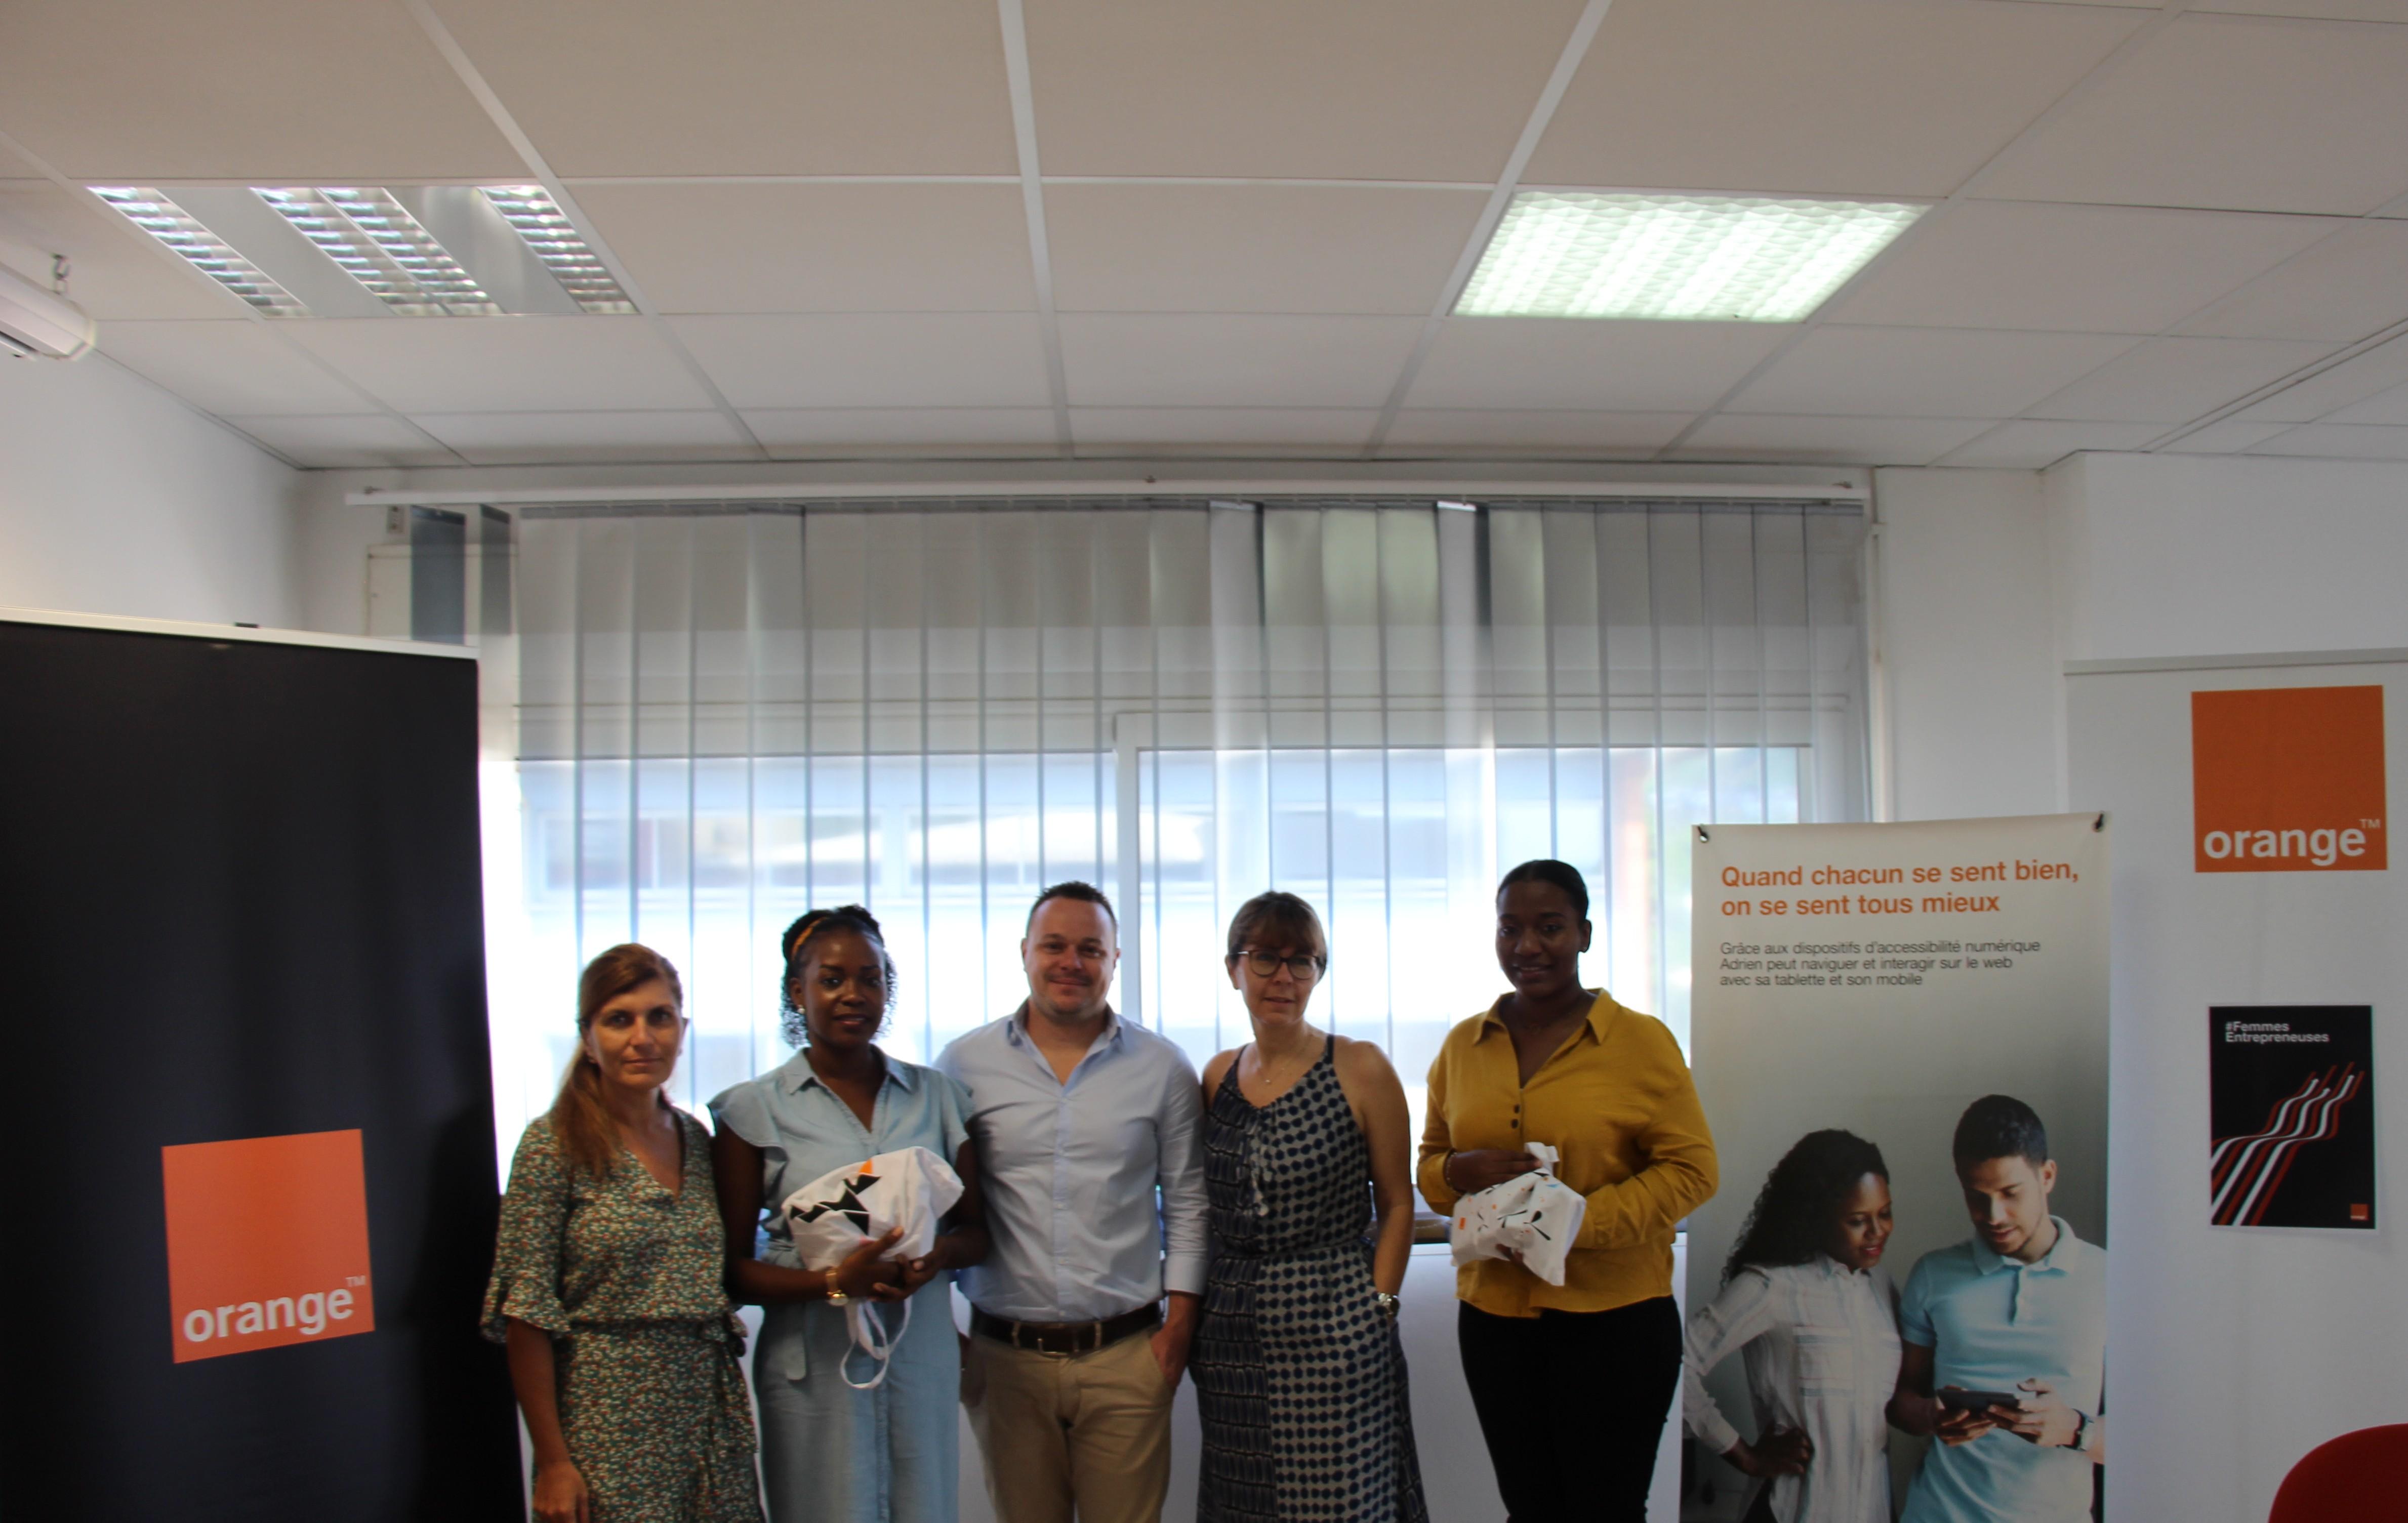 De gauche à droite: Mireille HELOU, Tasmia ABDOUROIHAMAN,  Emmanuel LEGRAS, Gaelle LE VU, Samienti SAID ©Orange